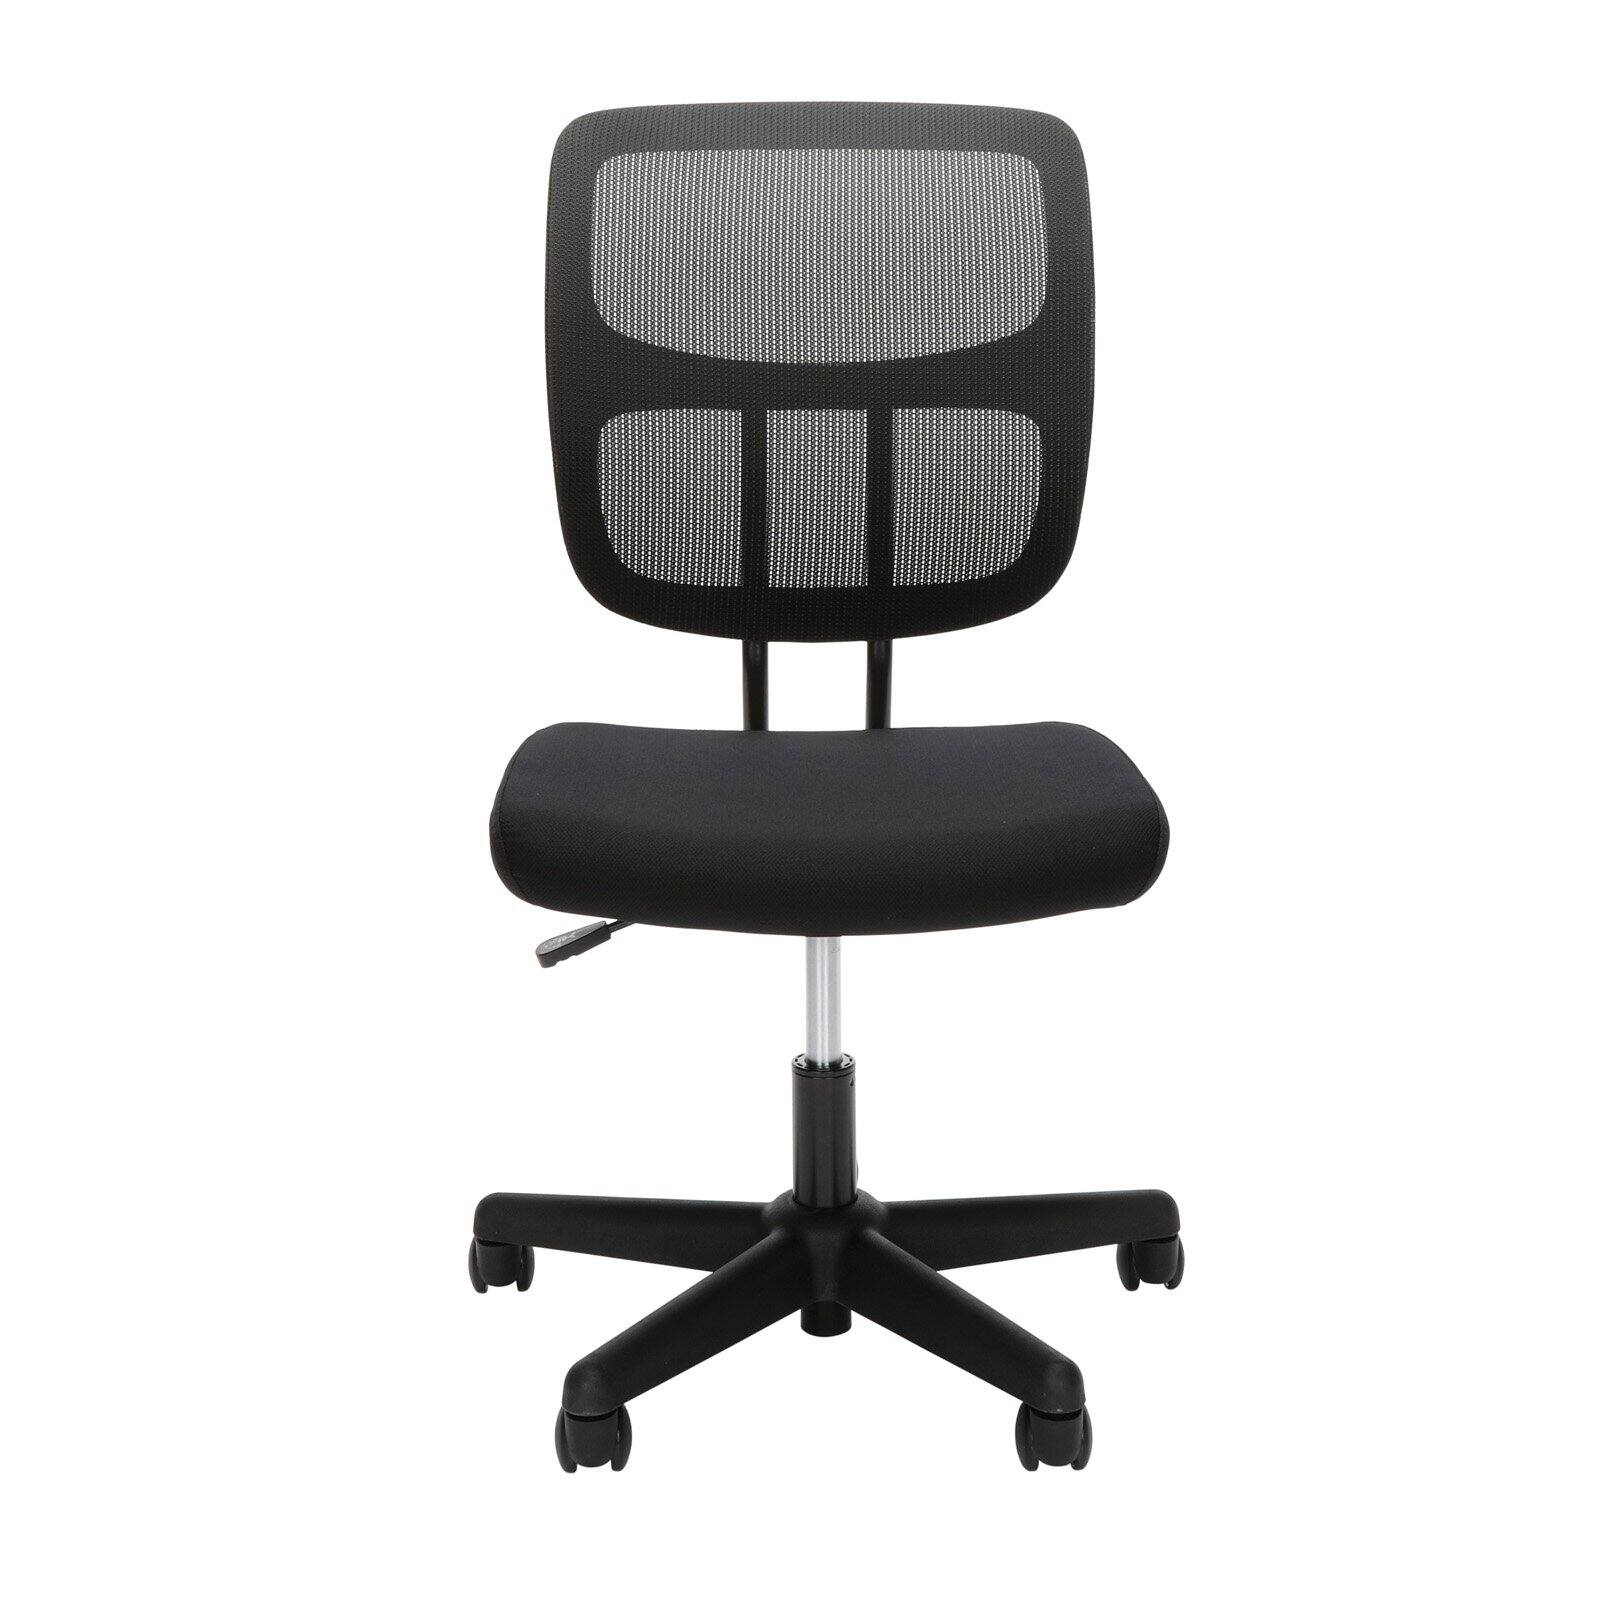 Ofm Essentials Series Armless Mesh Office Chair In Black Ess 3002 Walmart Com Walmart Com